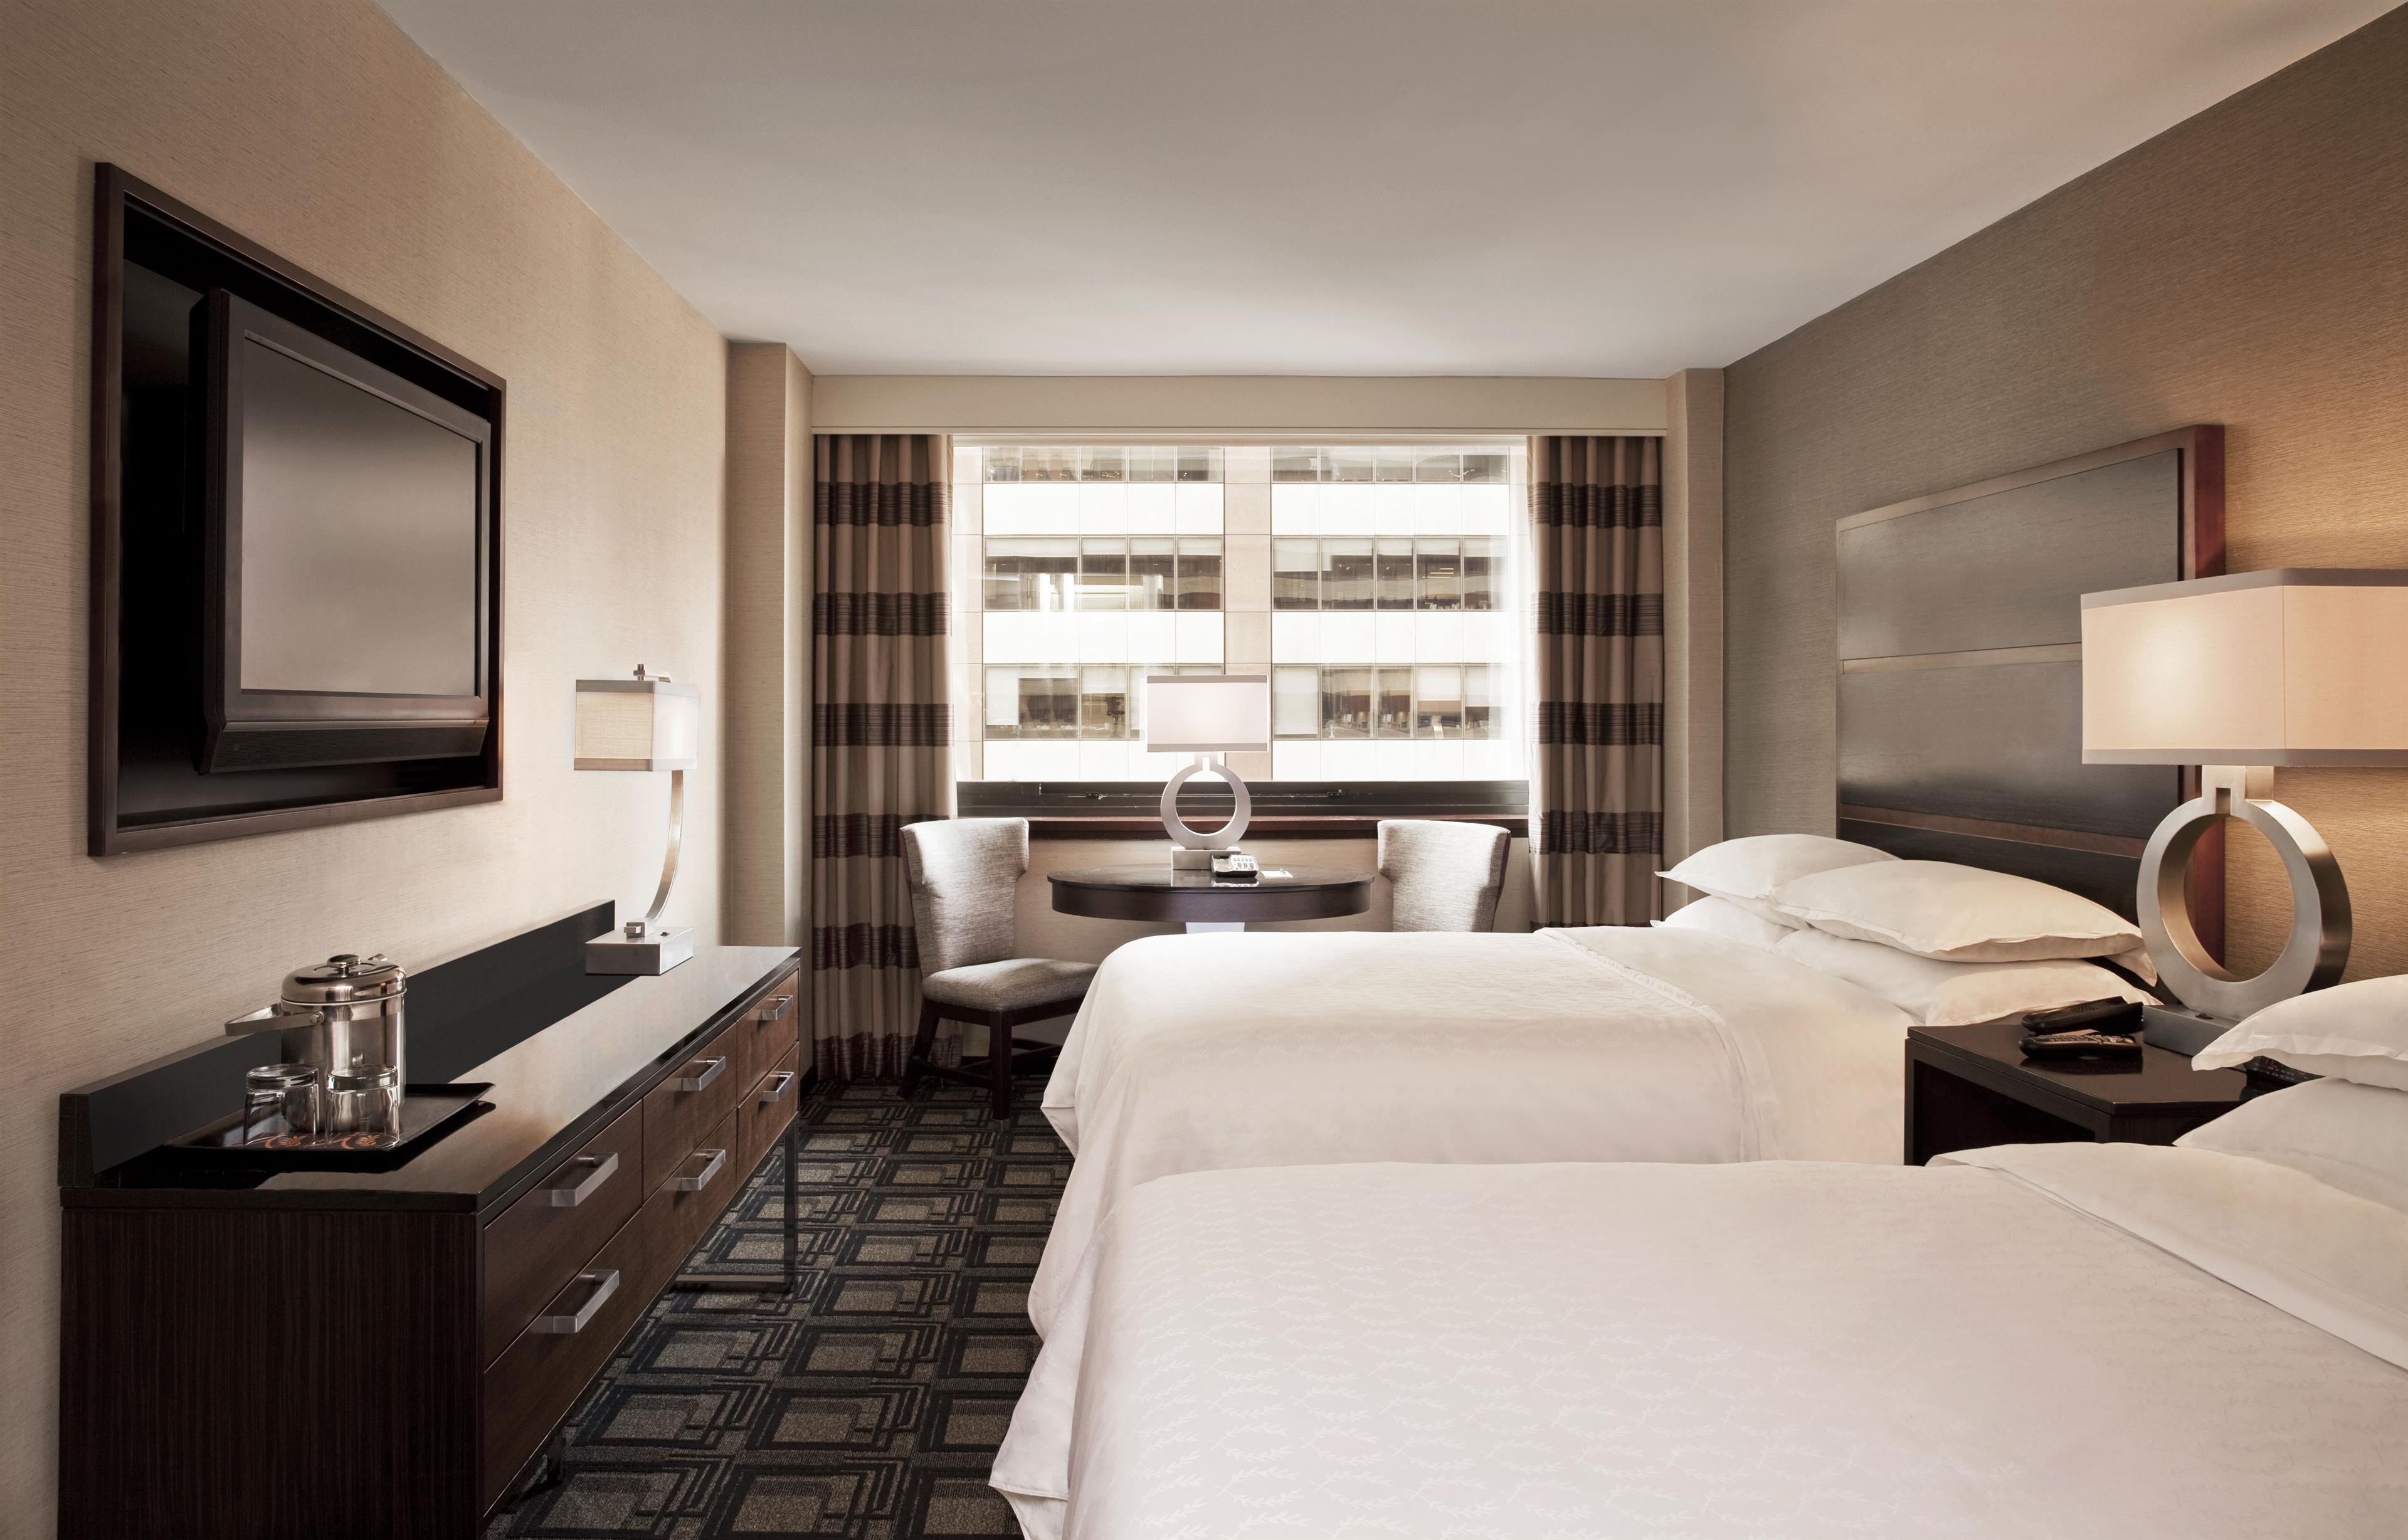 Sheraton New York Times Square Hotel image 5